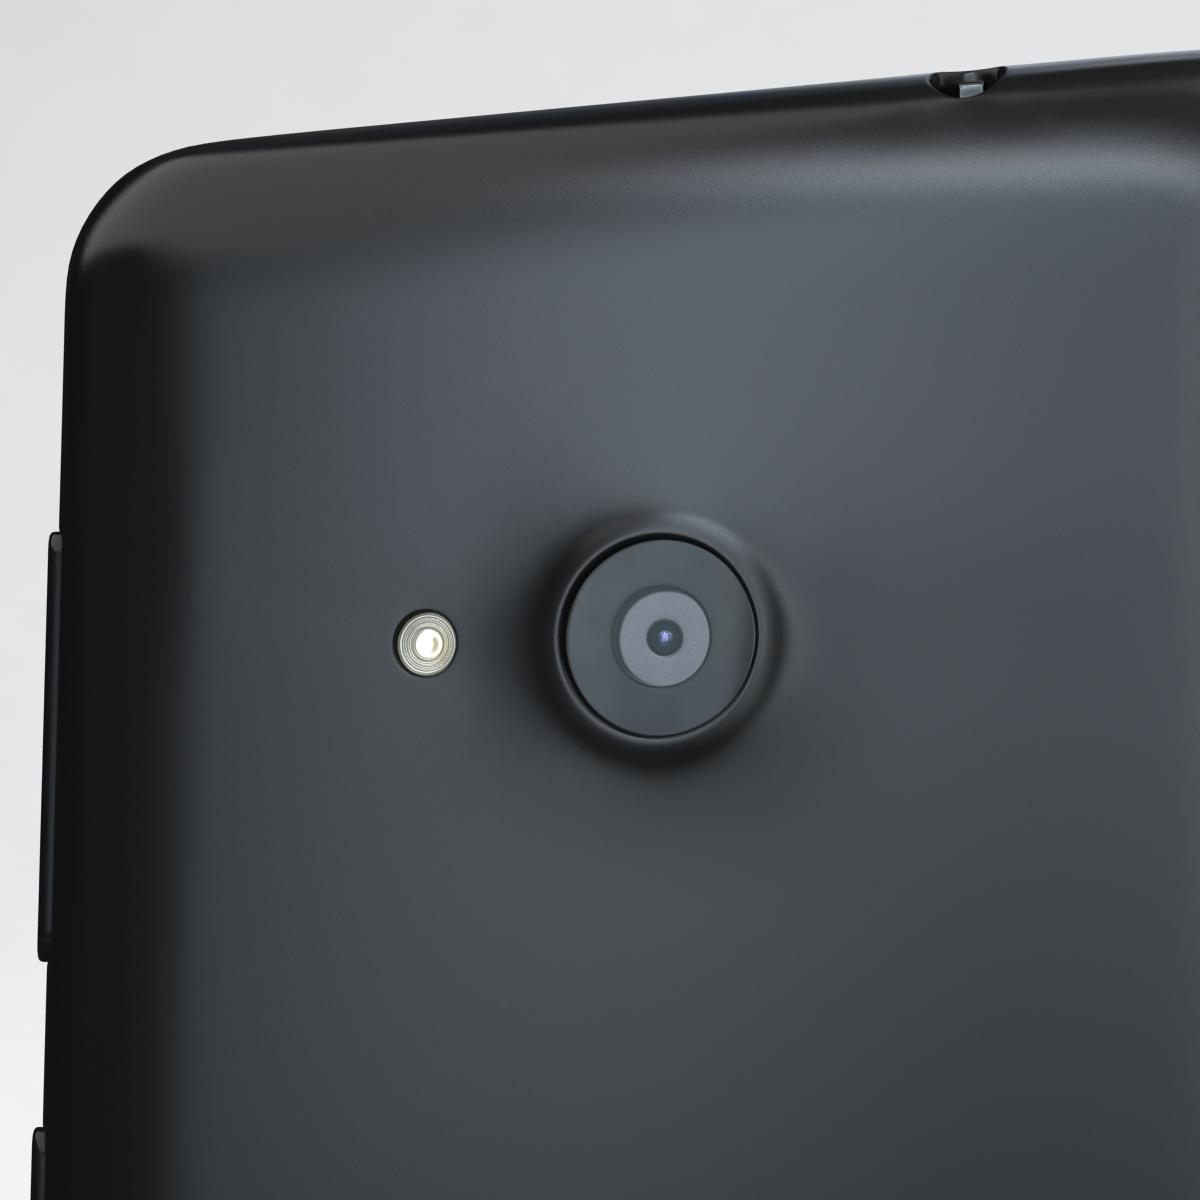 microsoft lumia 535 and dual sim black 3d model 3ds max fbx c4d obj 204359